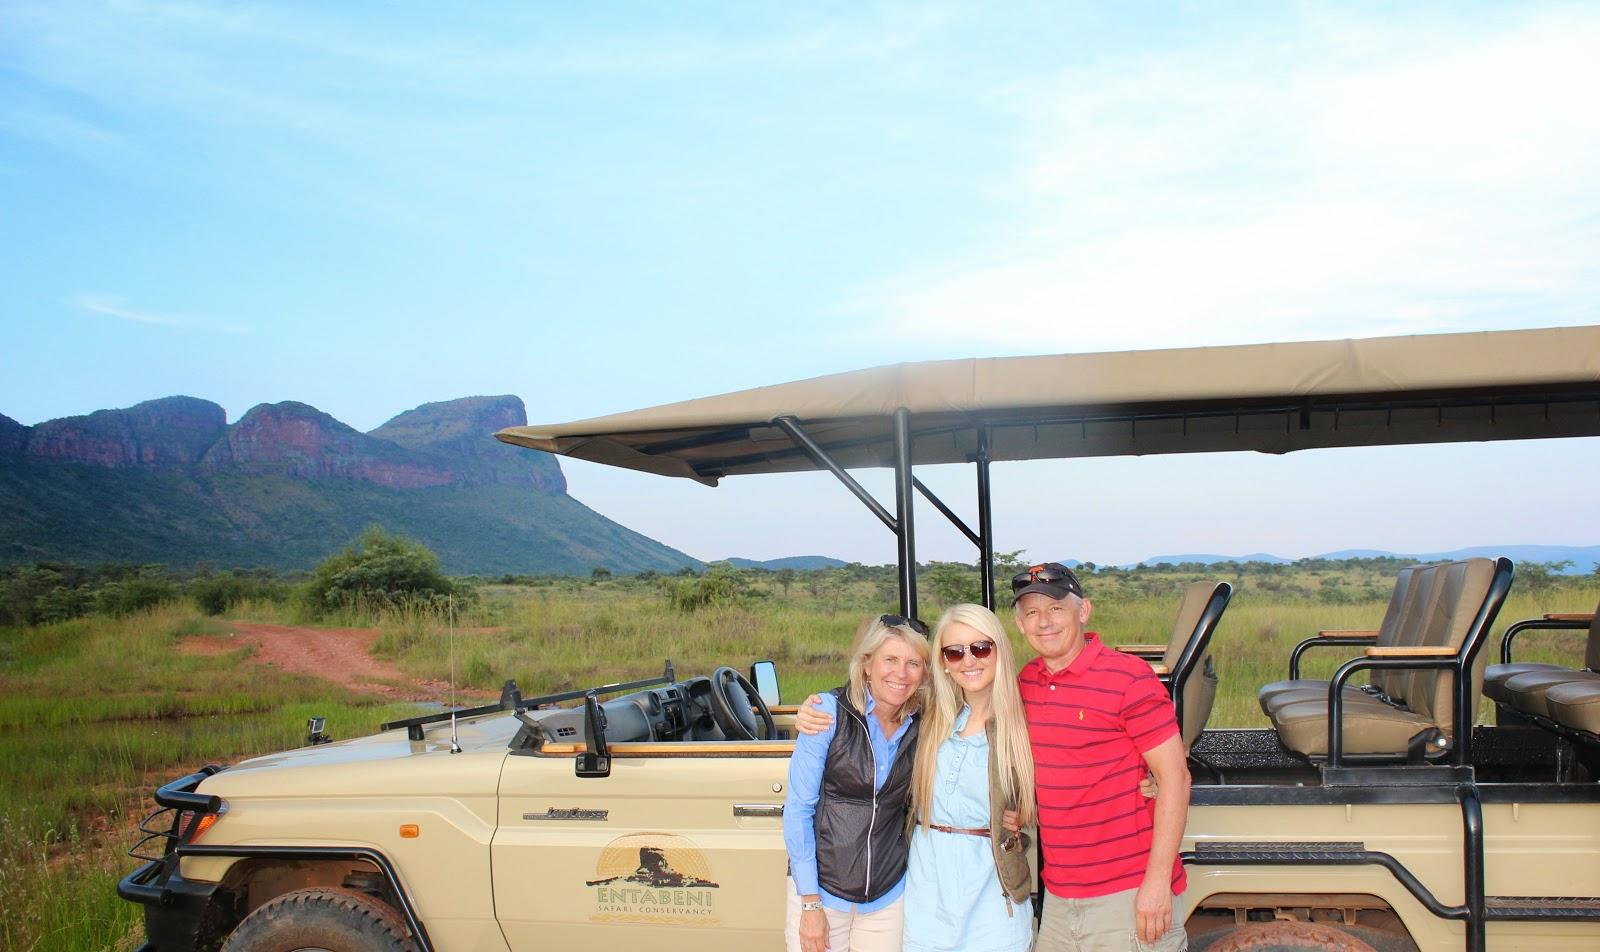 safari at legend lodges